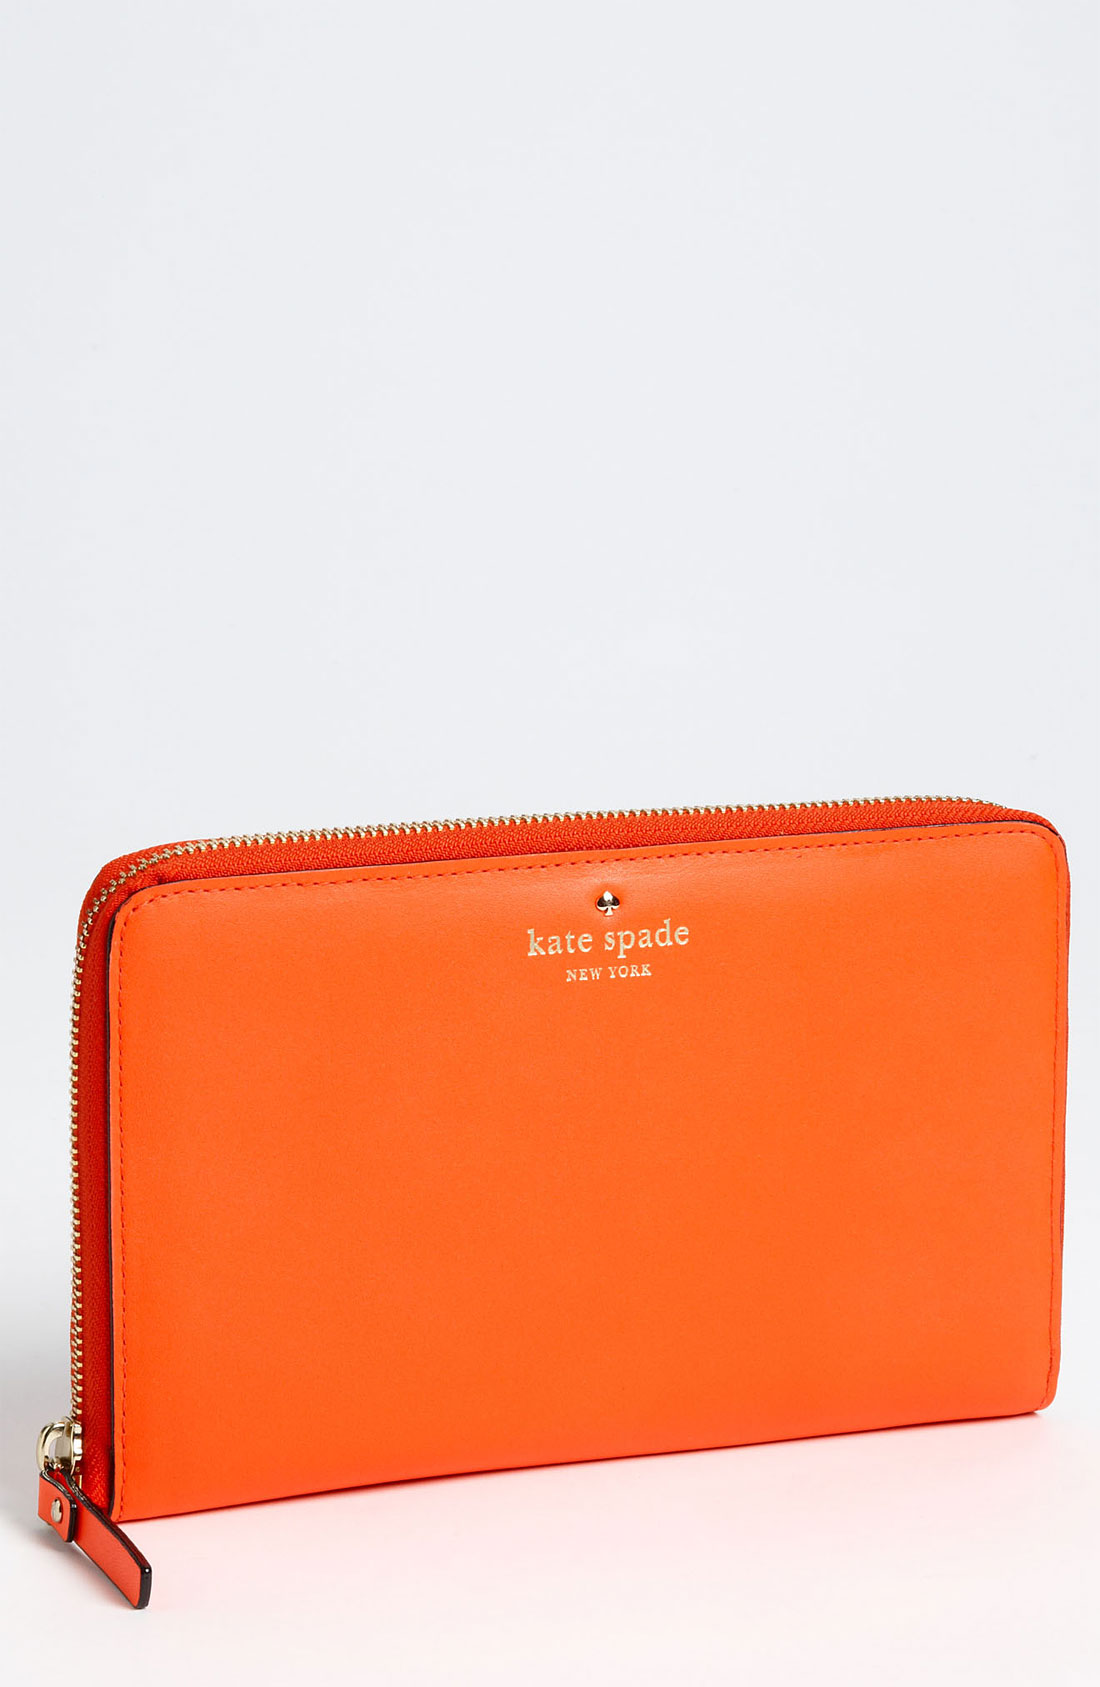 Kate Spade Brightspot Avenue Large Travel Wallet In Orange